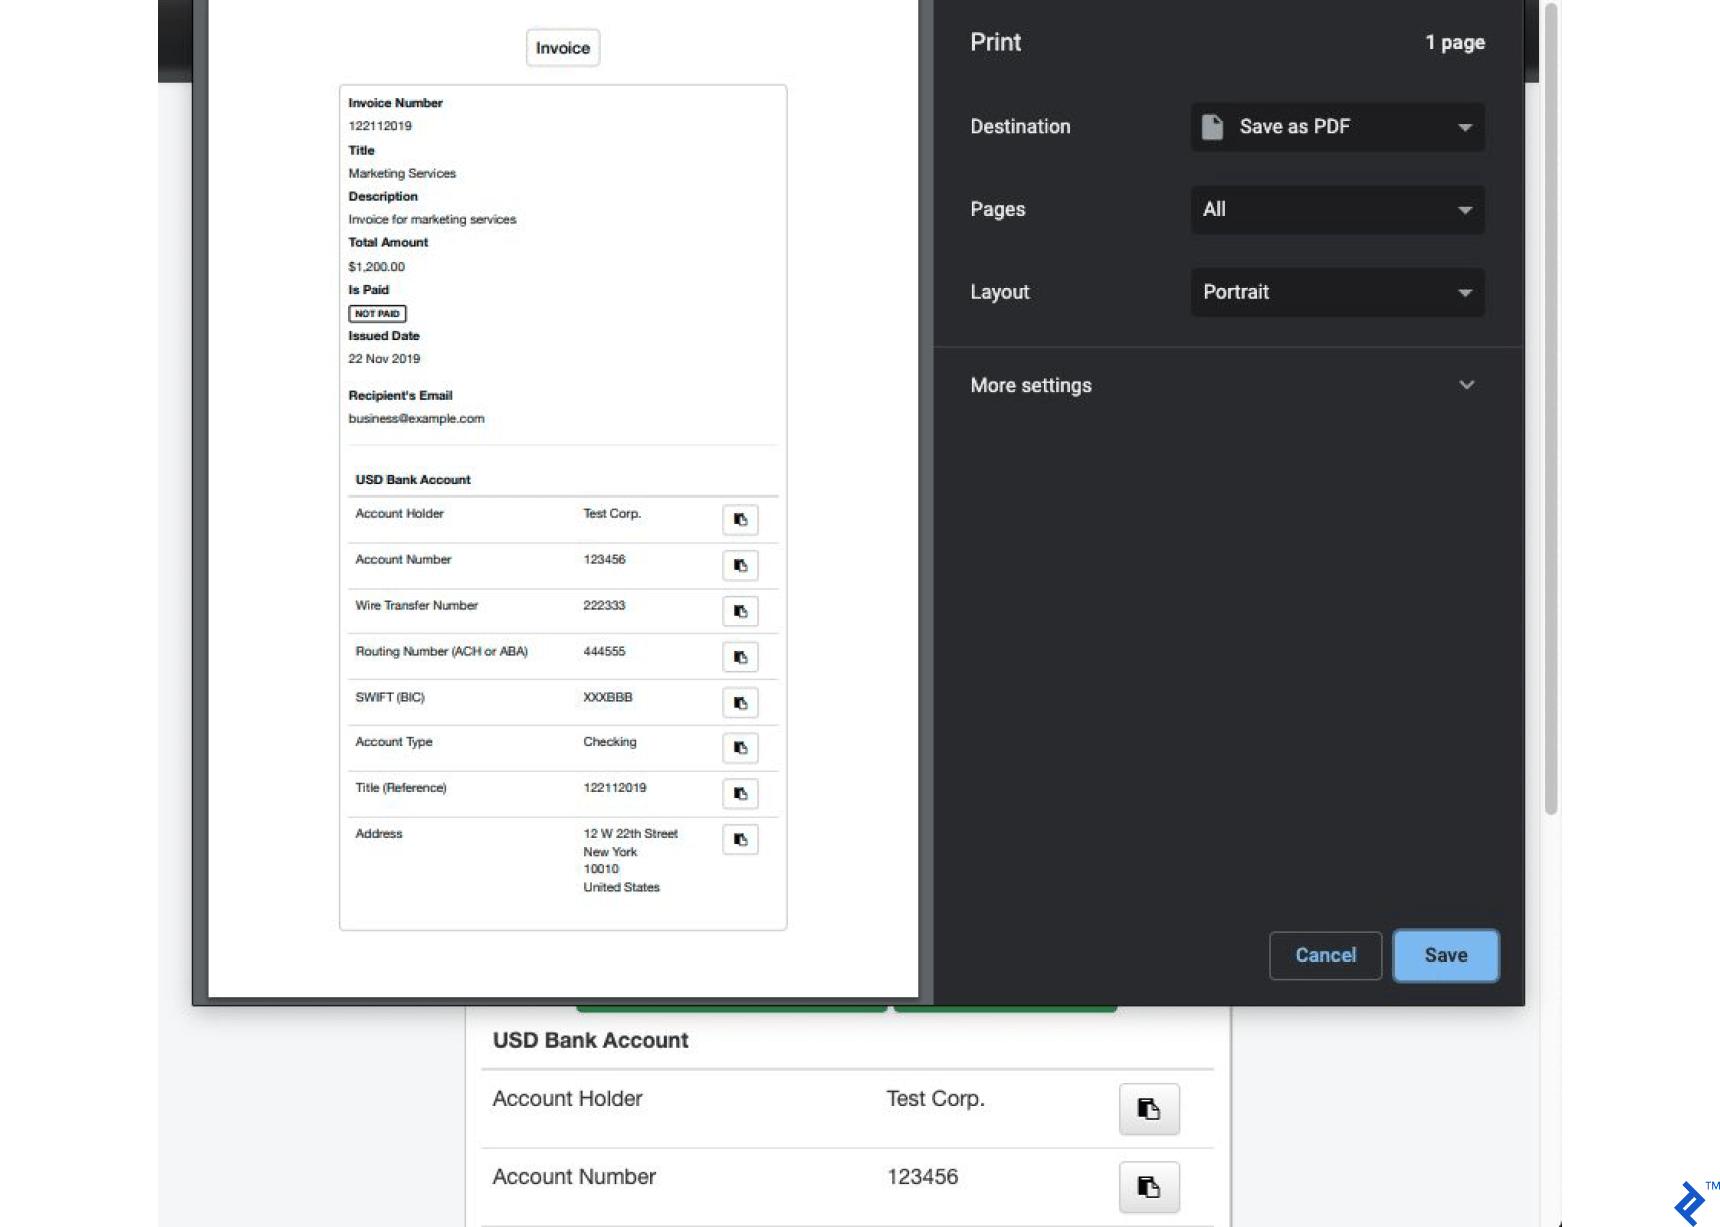 Invoice Printout